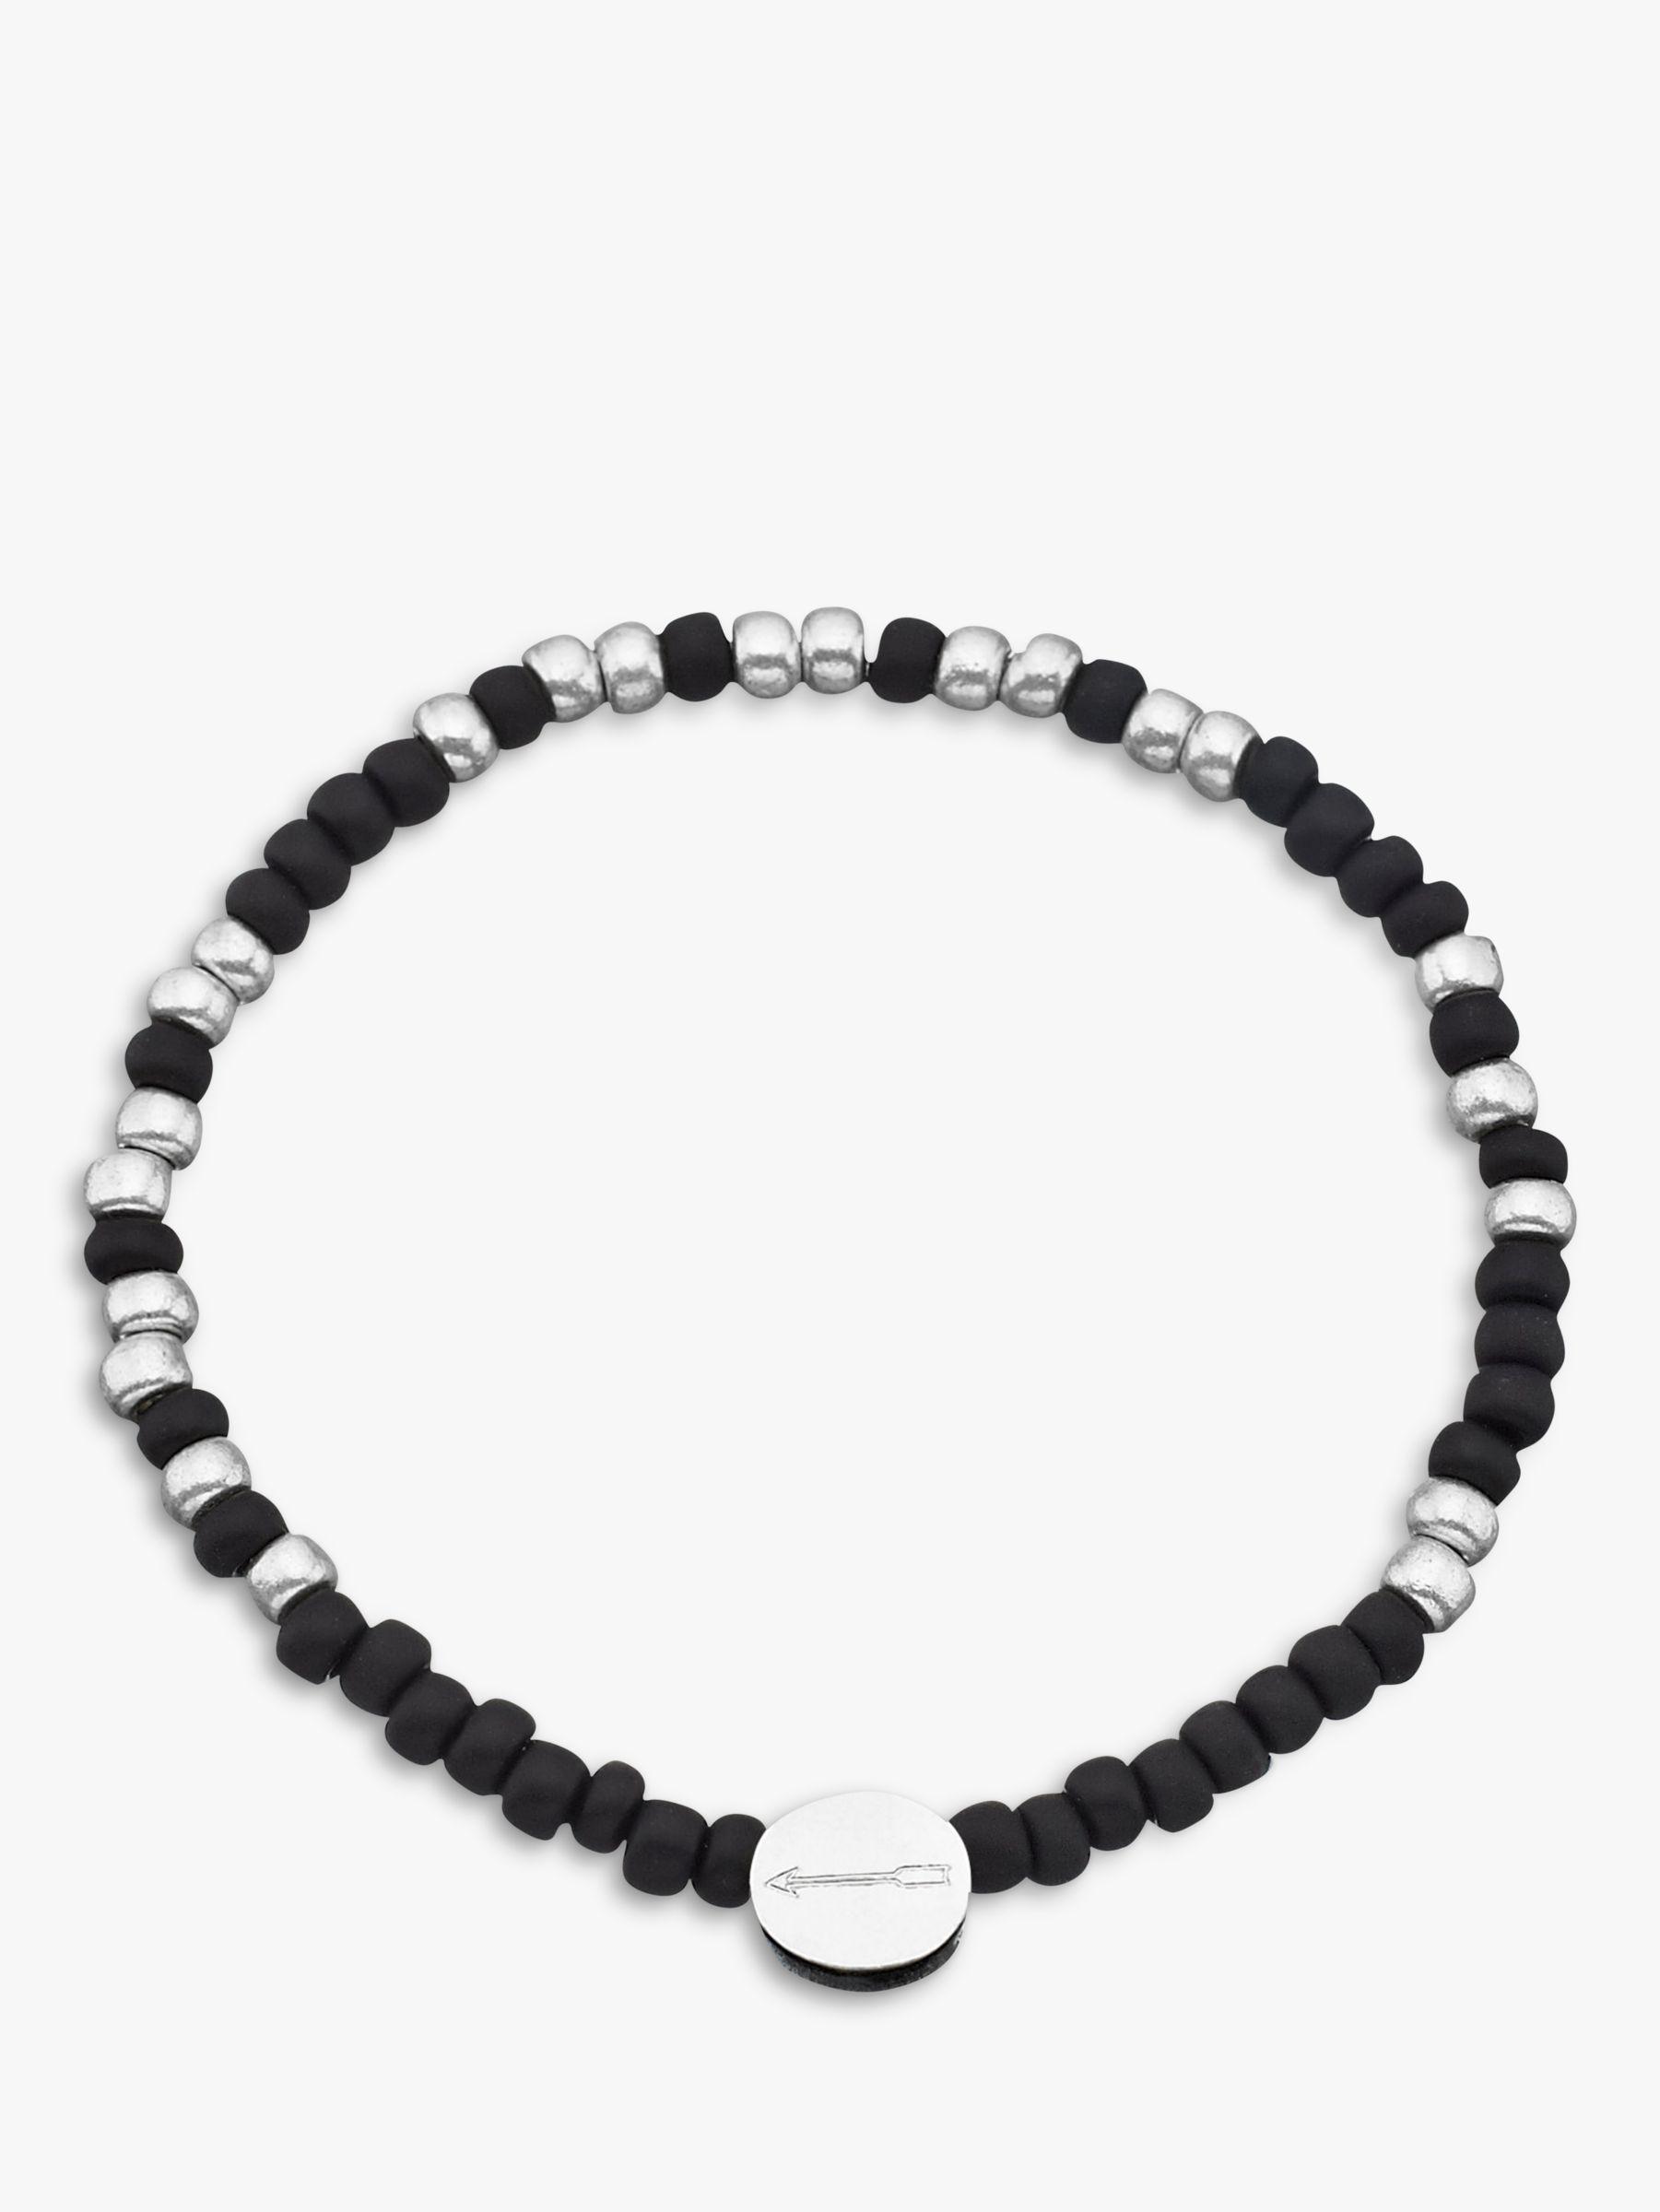 Under The Rose Under the Rose Morse Code '21st' Bead Bracelet